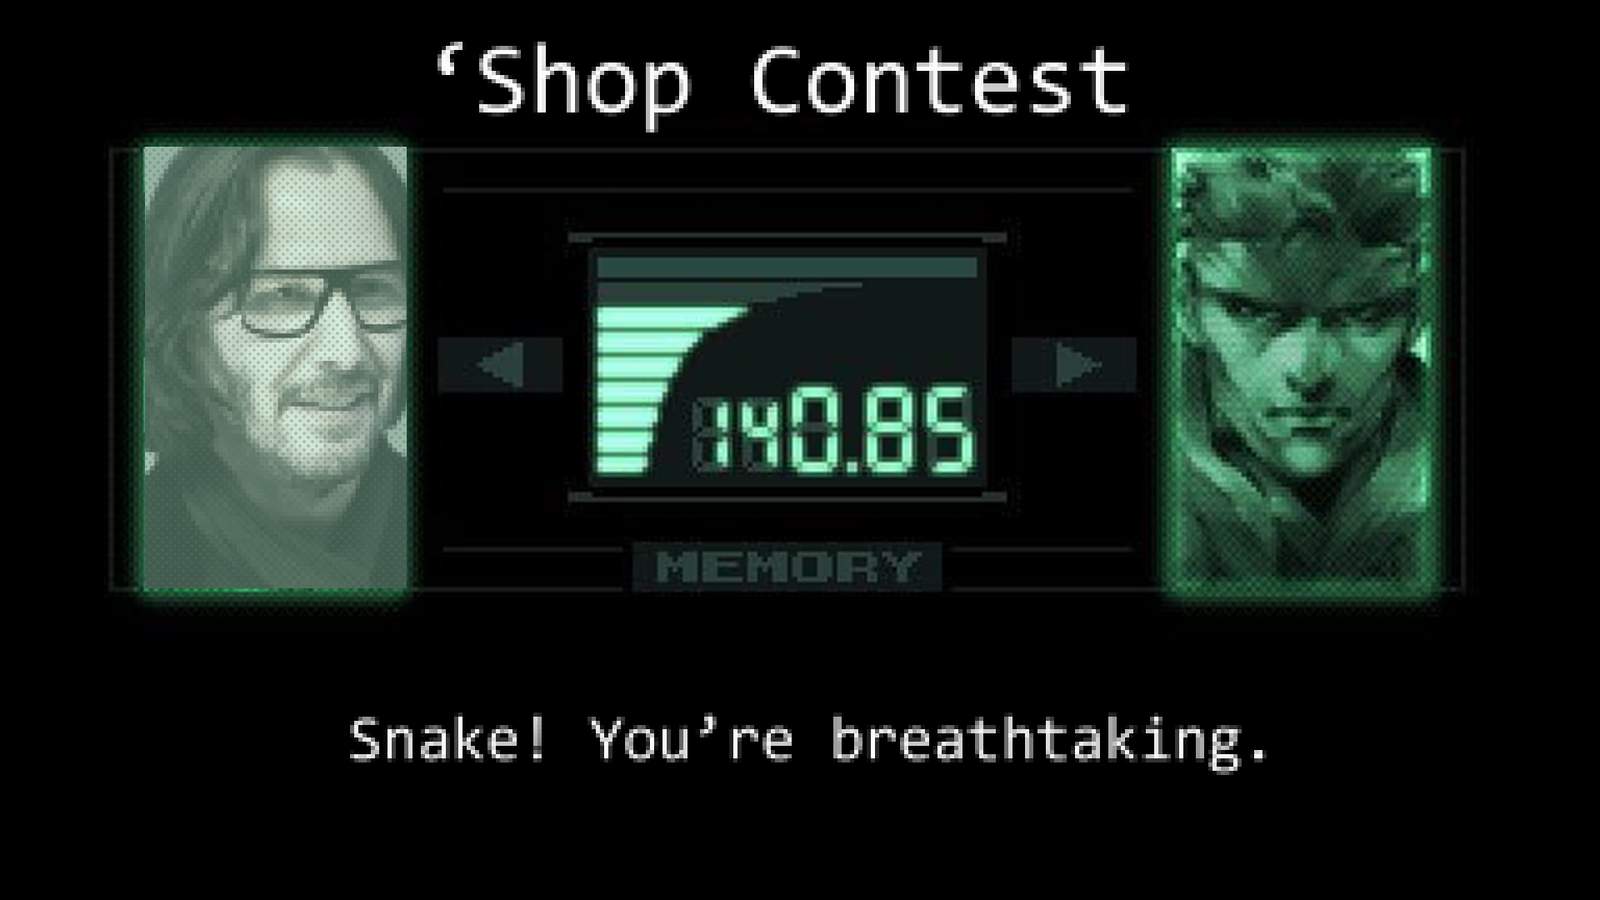 QnA VBage 'Shop Contest: Keanu Reeves